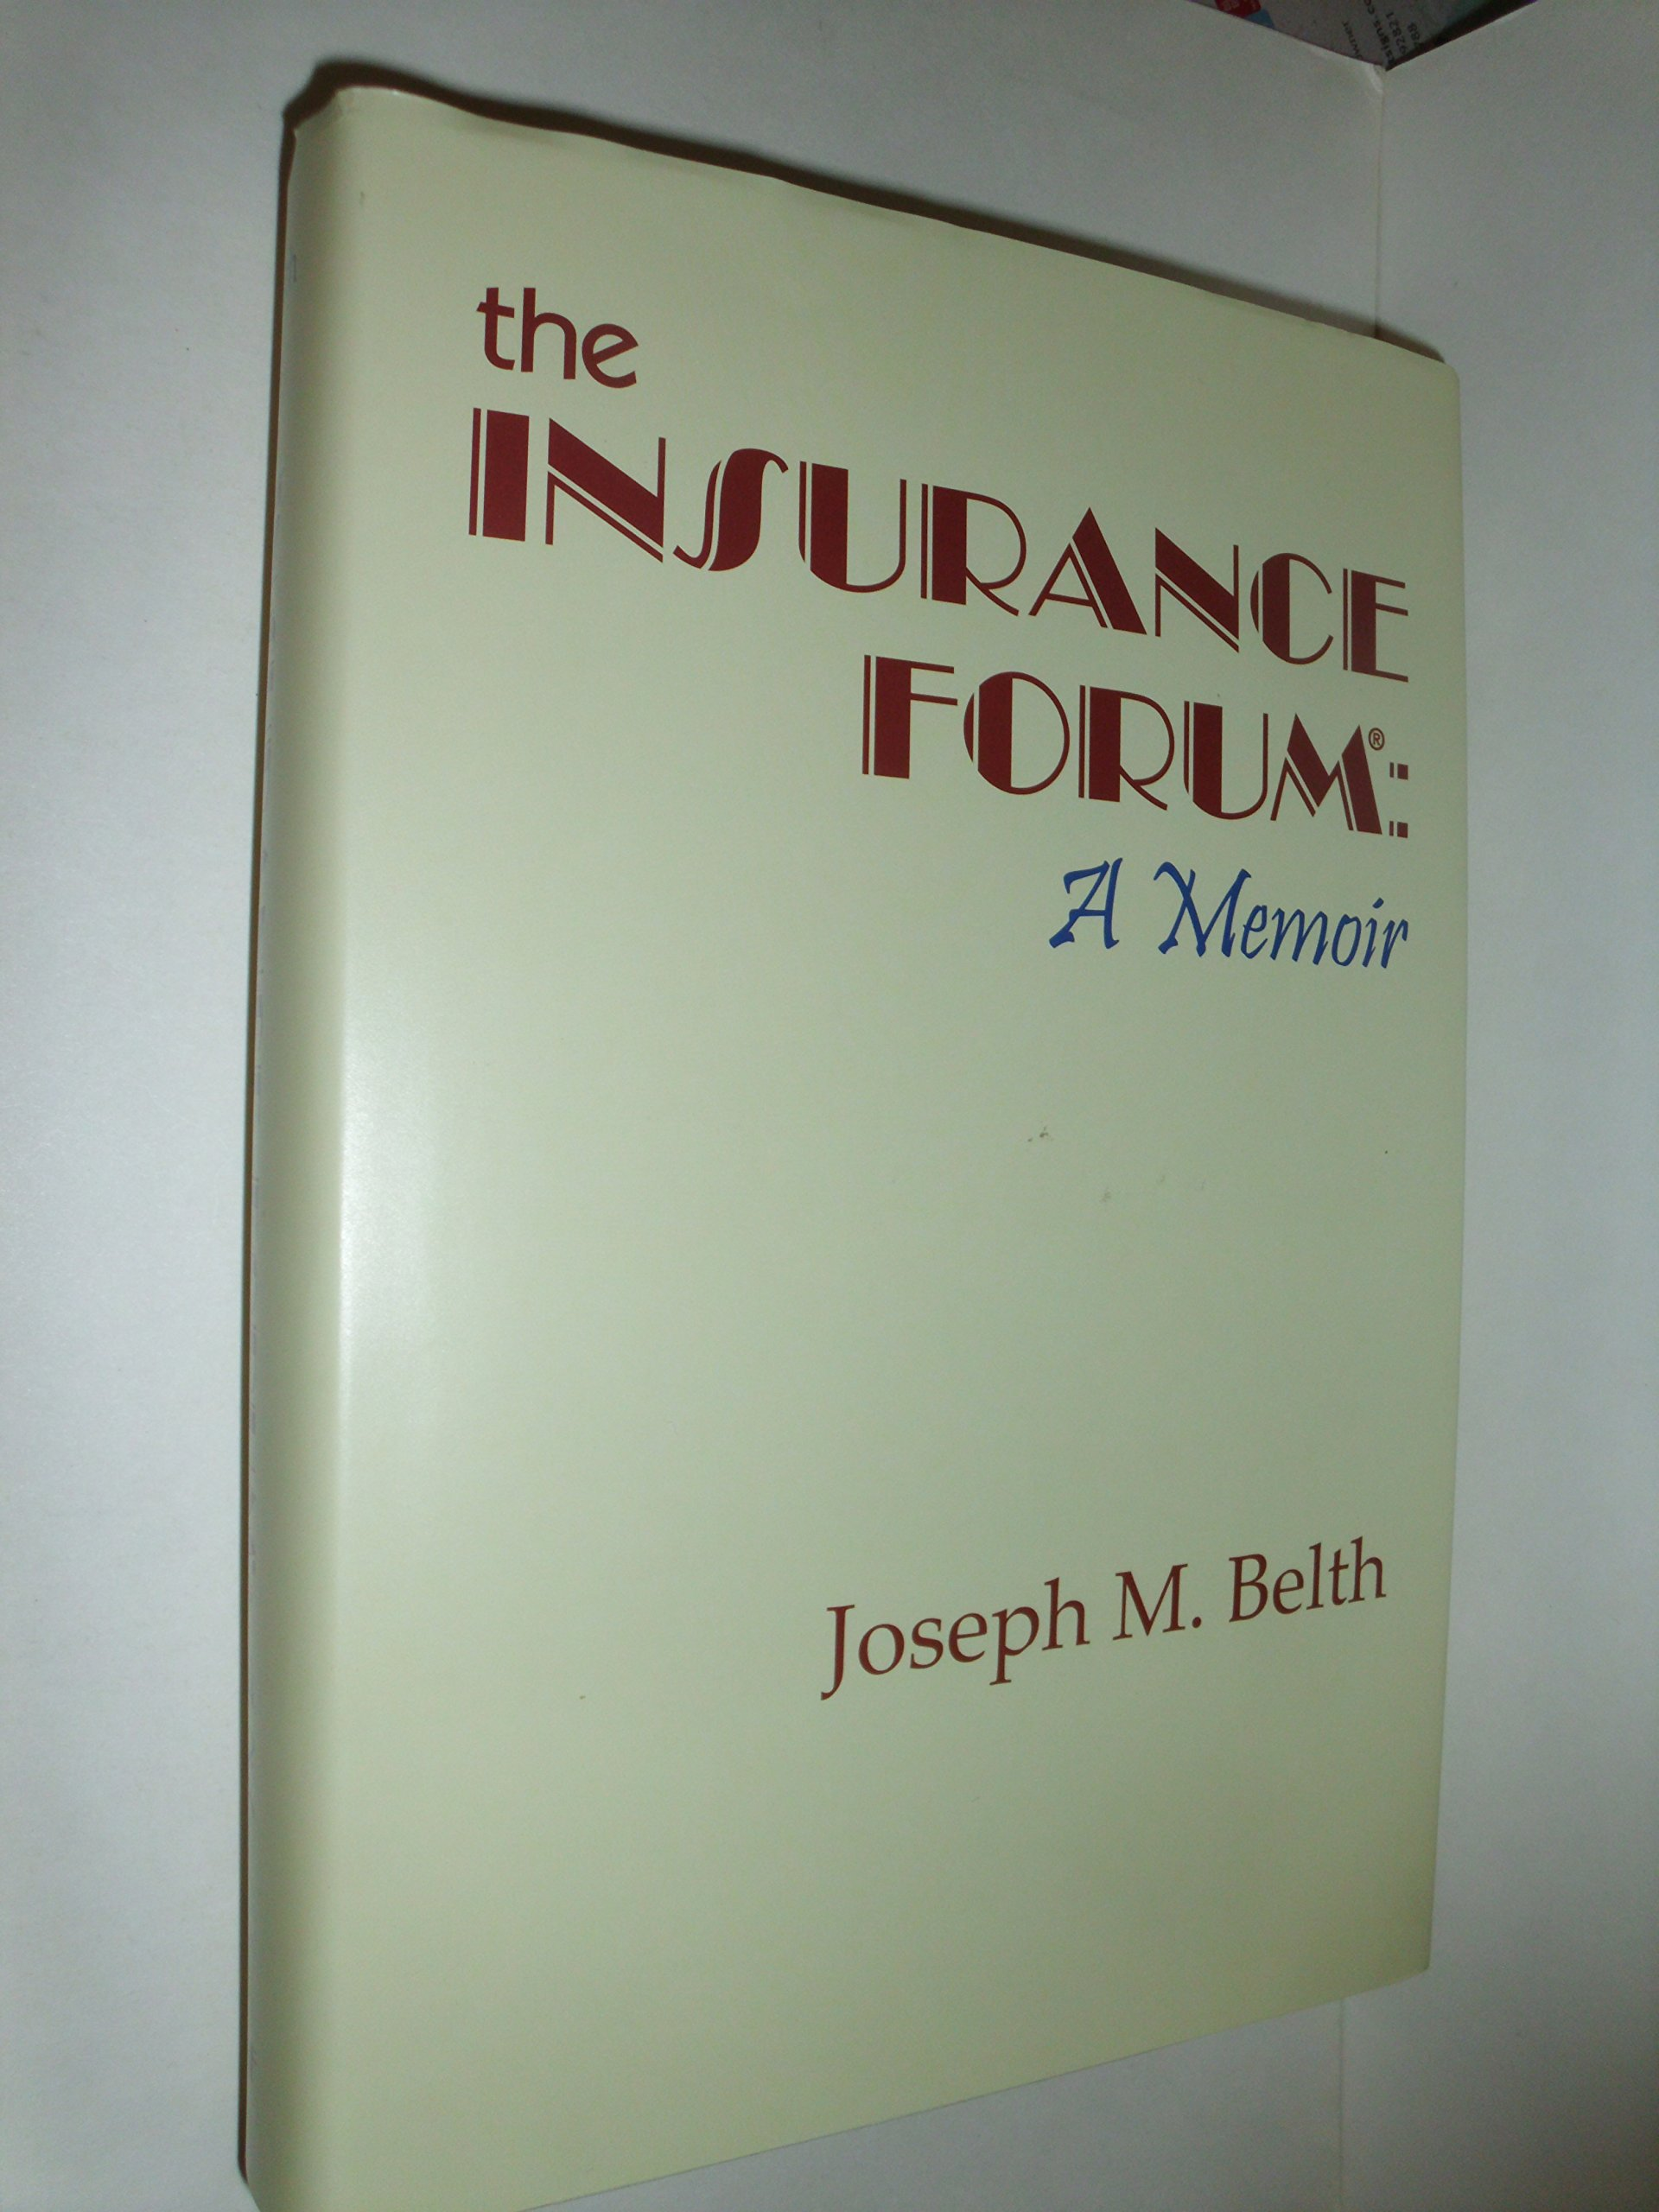 The Insurance Forum: A Memoir: Joseph M Belth: 9780941173186: Amazon:  Books